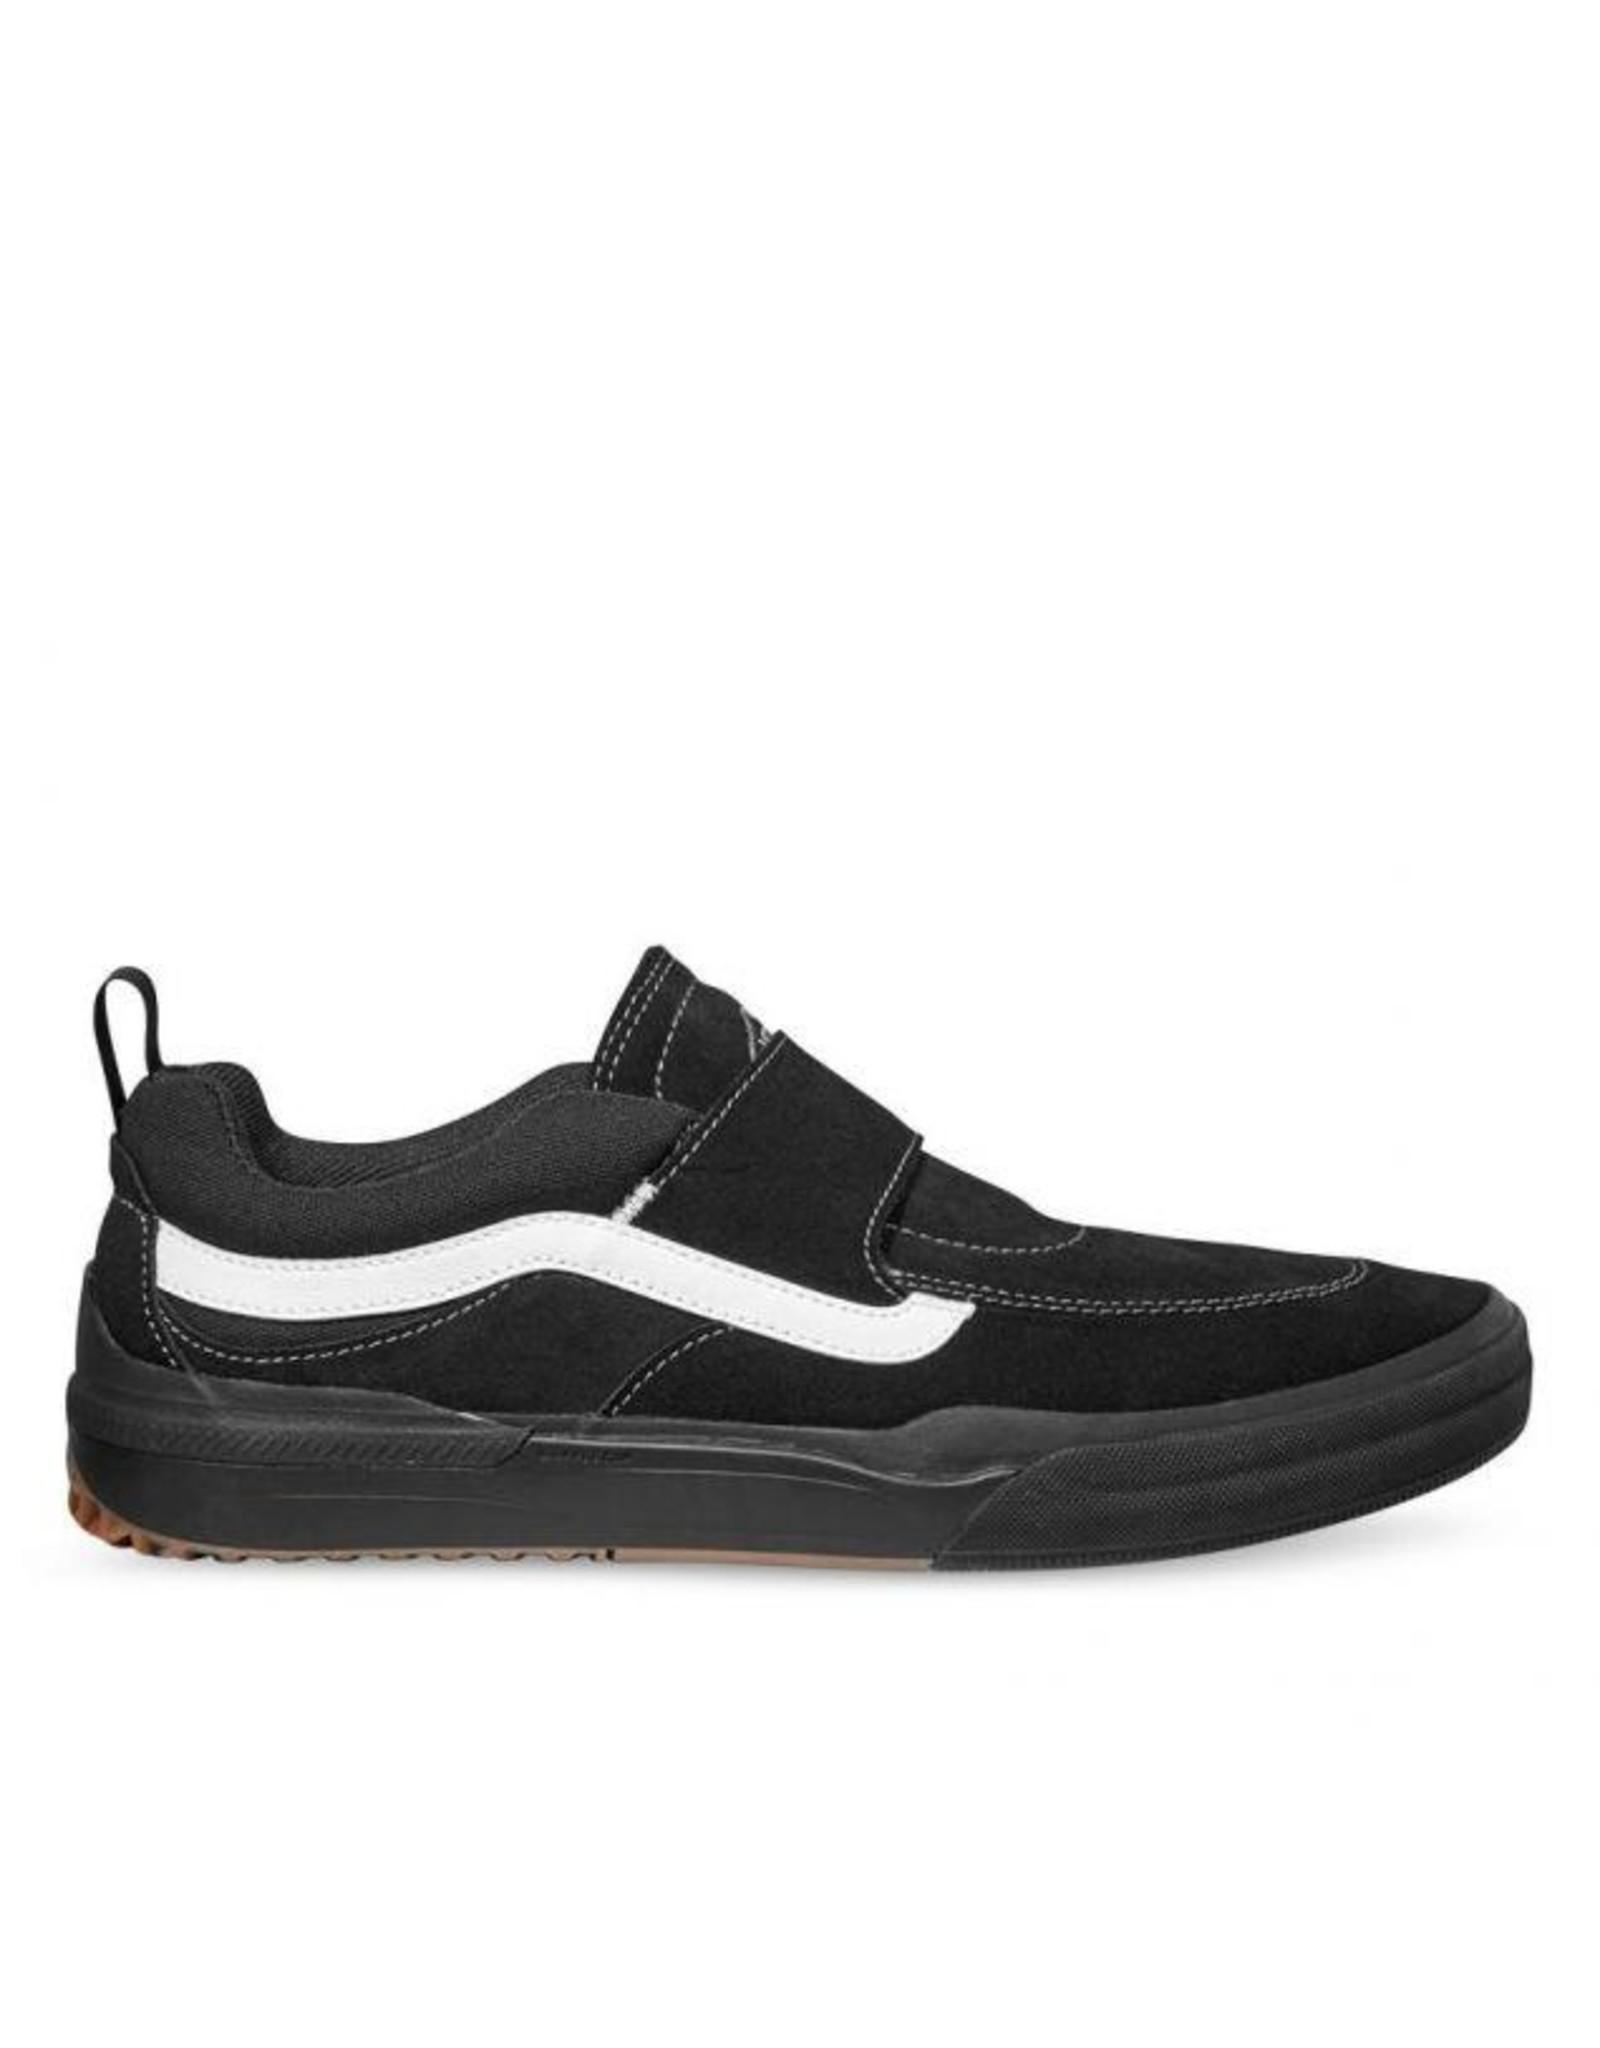 VANS VANS - WALKER PRO 2 - BLACK/WHITE -